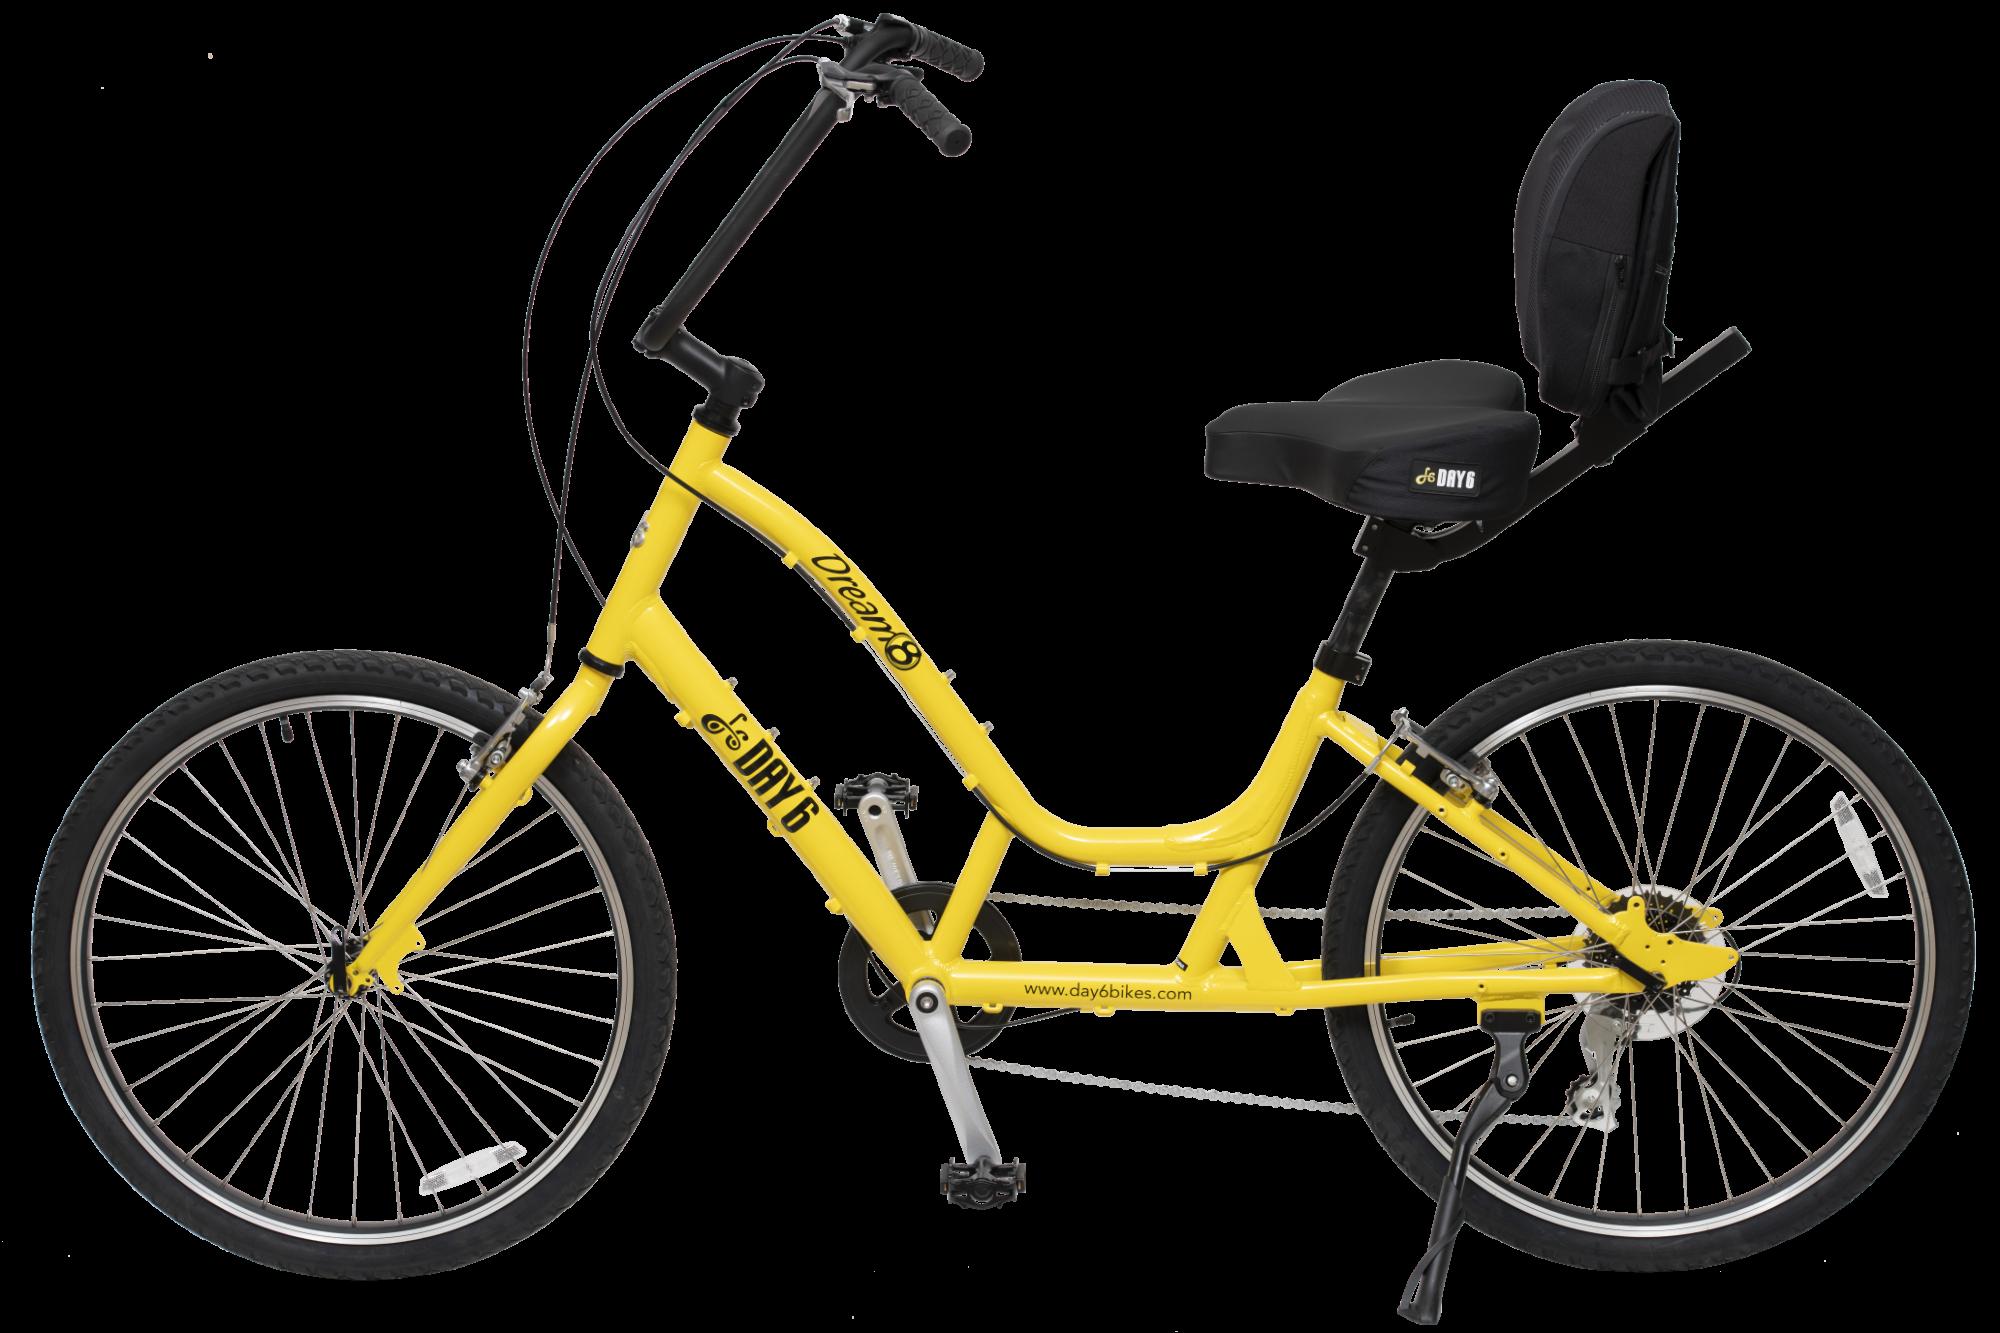 Dream8/Large/Metallic Yellow/Contour Seat